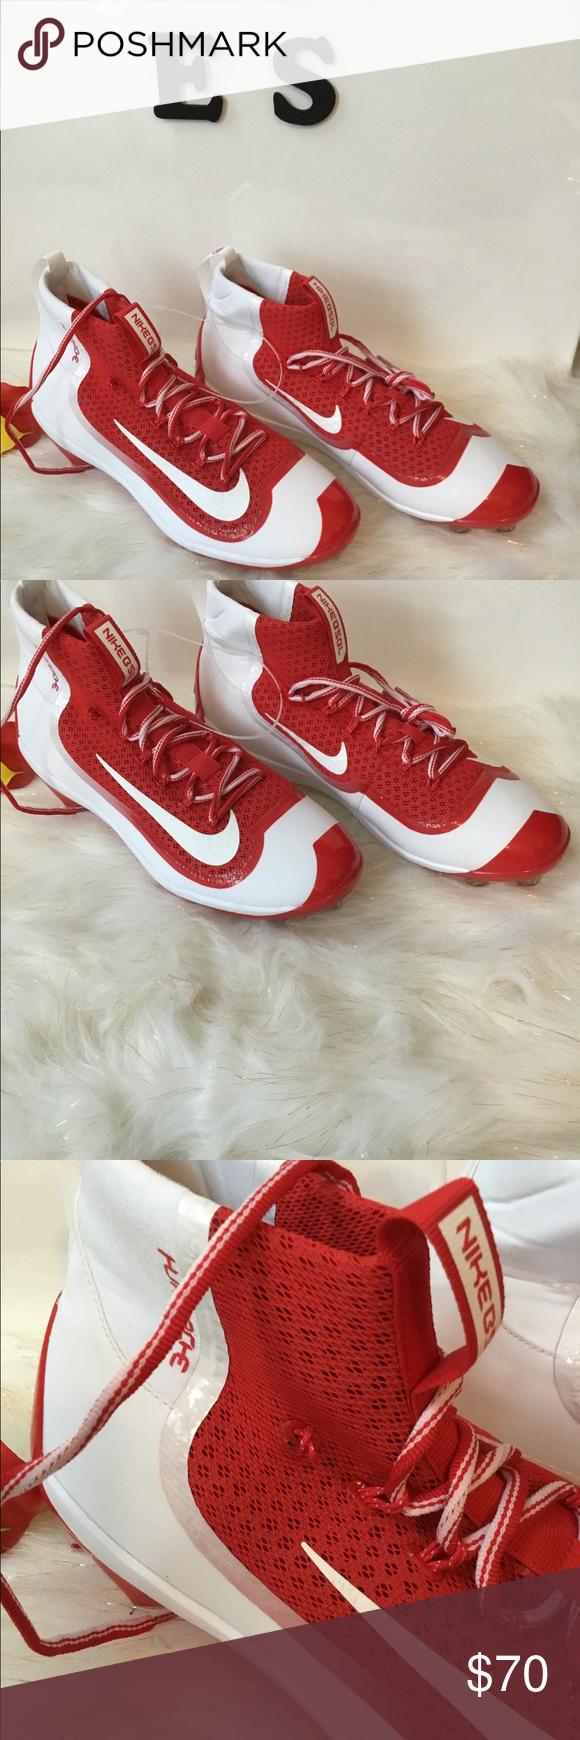 quality design 9108e 16a94 Spotted while shopping on Poshmark  Nike Huarache 2K Filth Men s Baseball  Cleats!  poshmark  fashion  shopping  style  Nike  Other